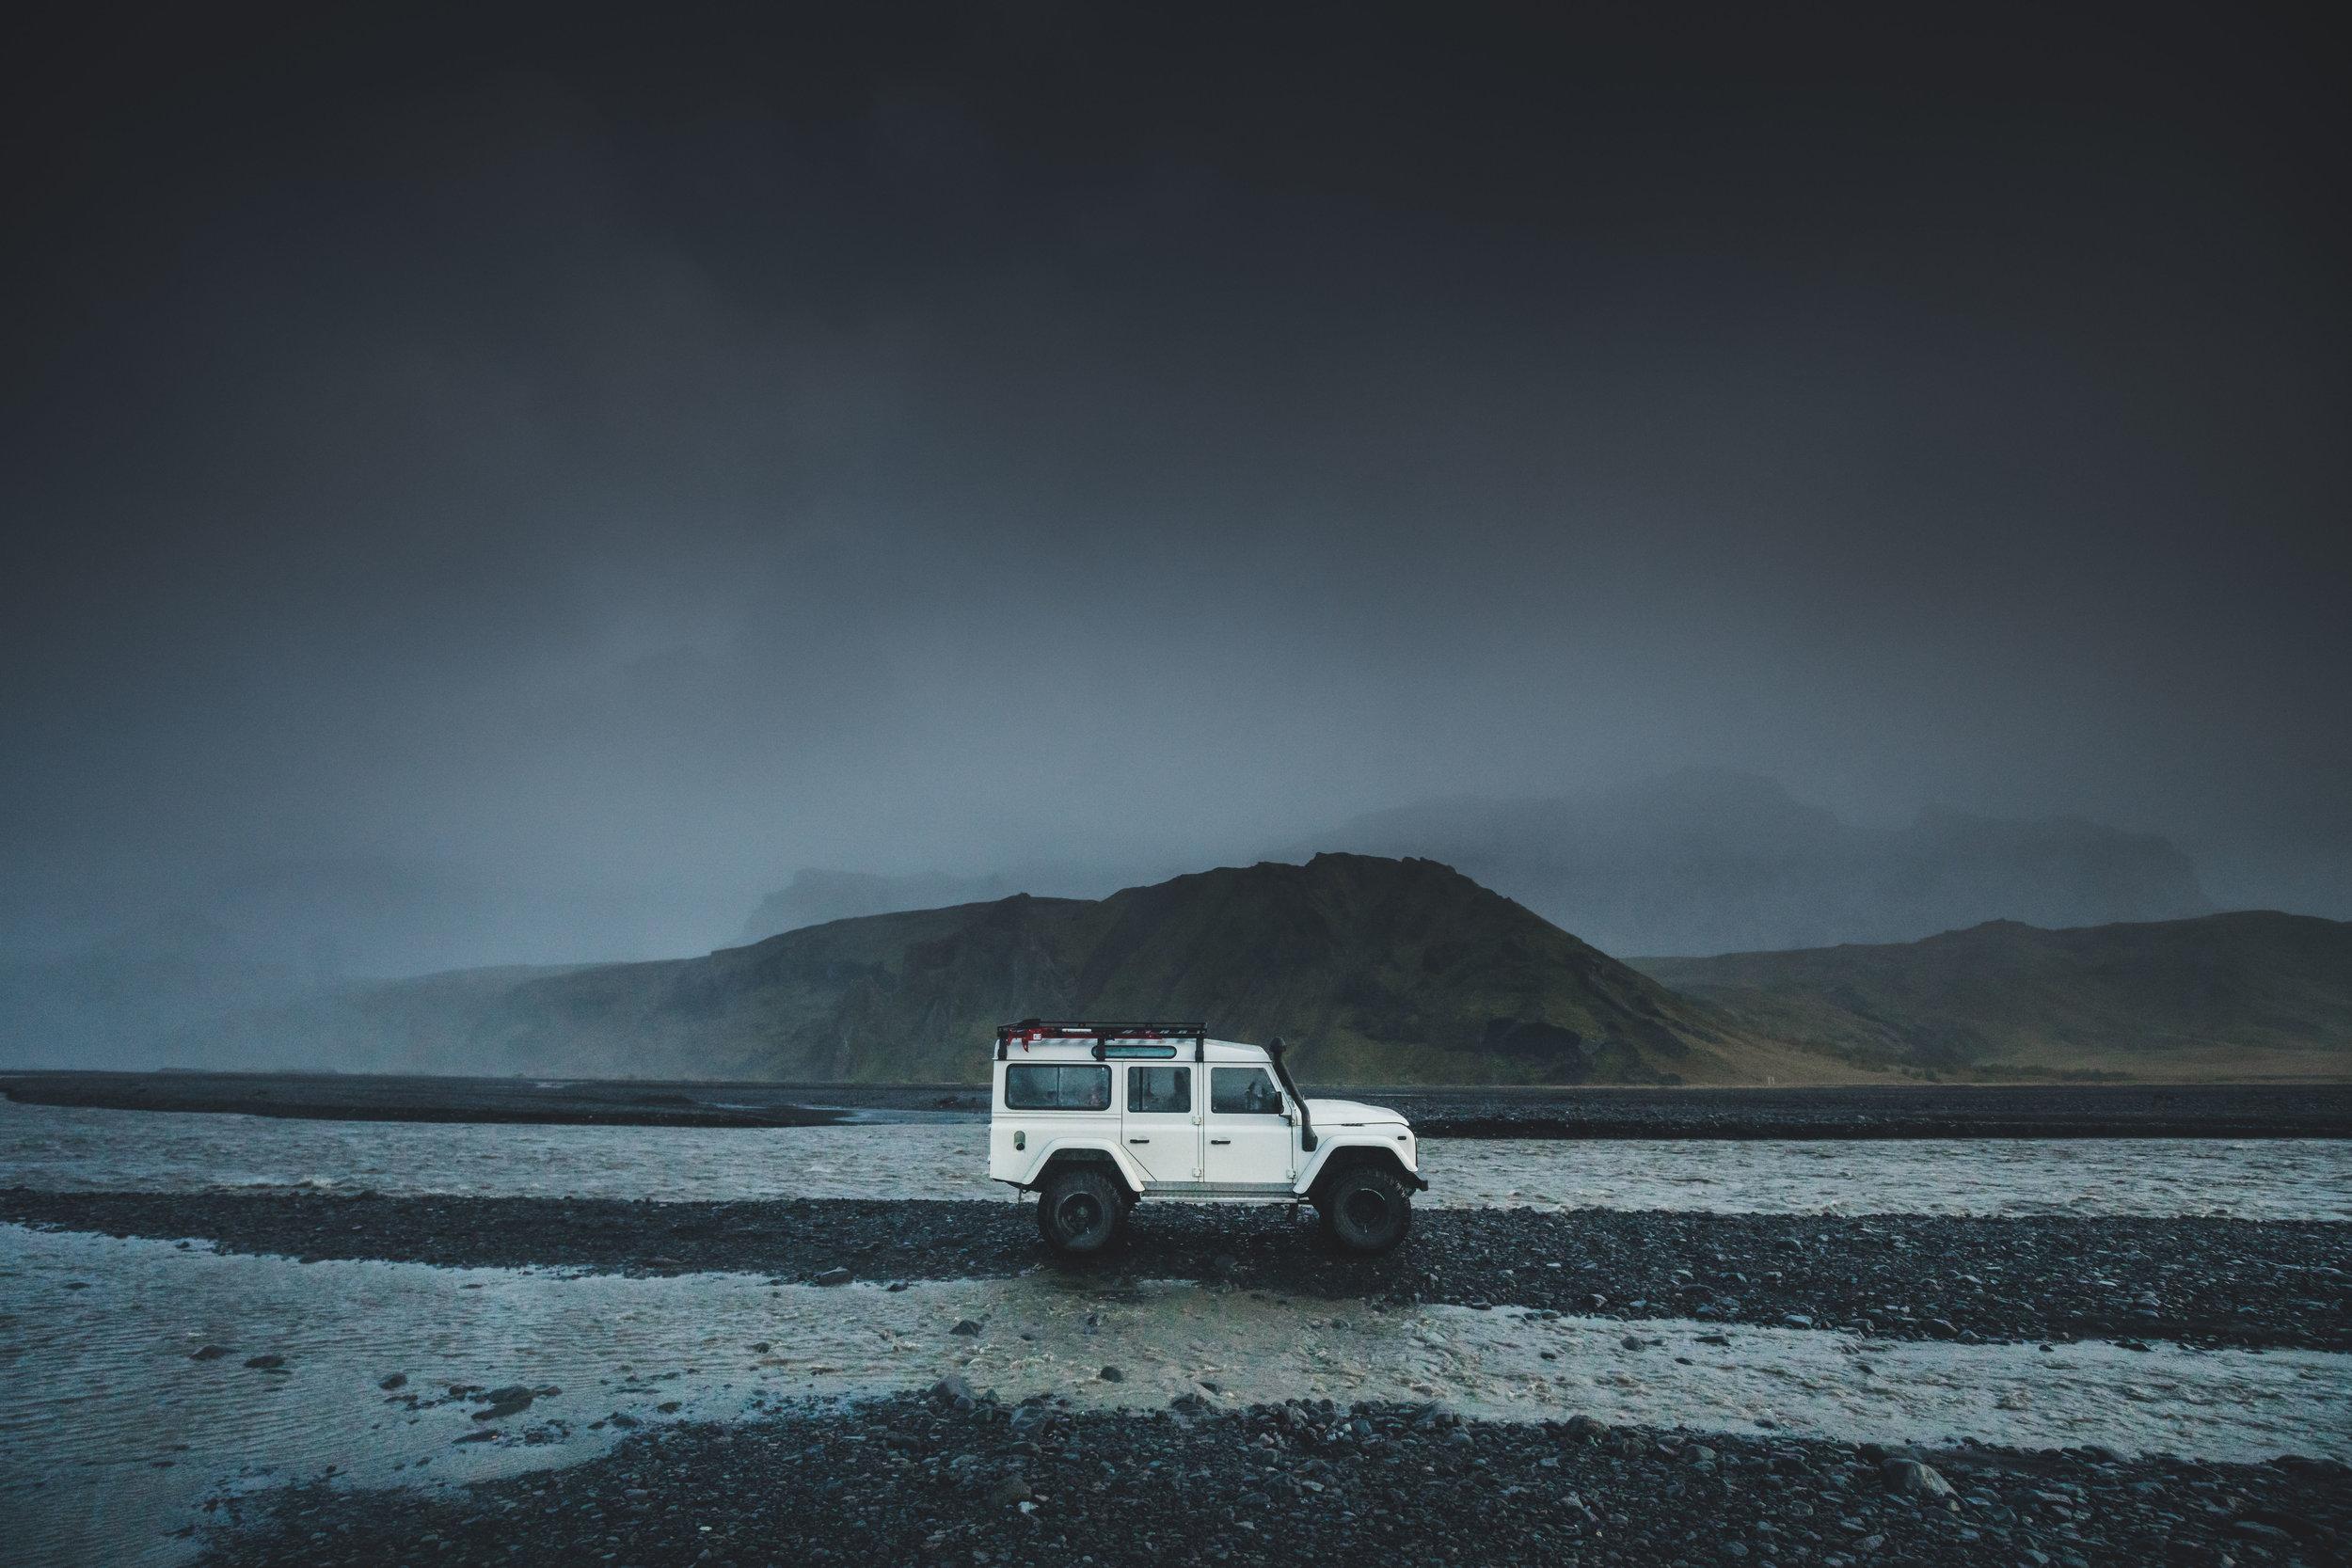 benjamin-hardman-fineart-iceland-photography-benjamin-hardman-ísland-landscape-untitled_DSC0107-2.jpg